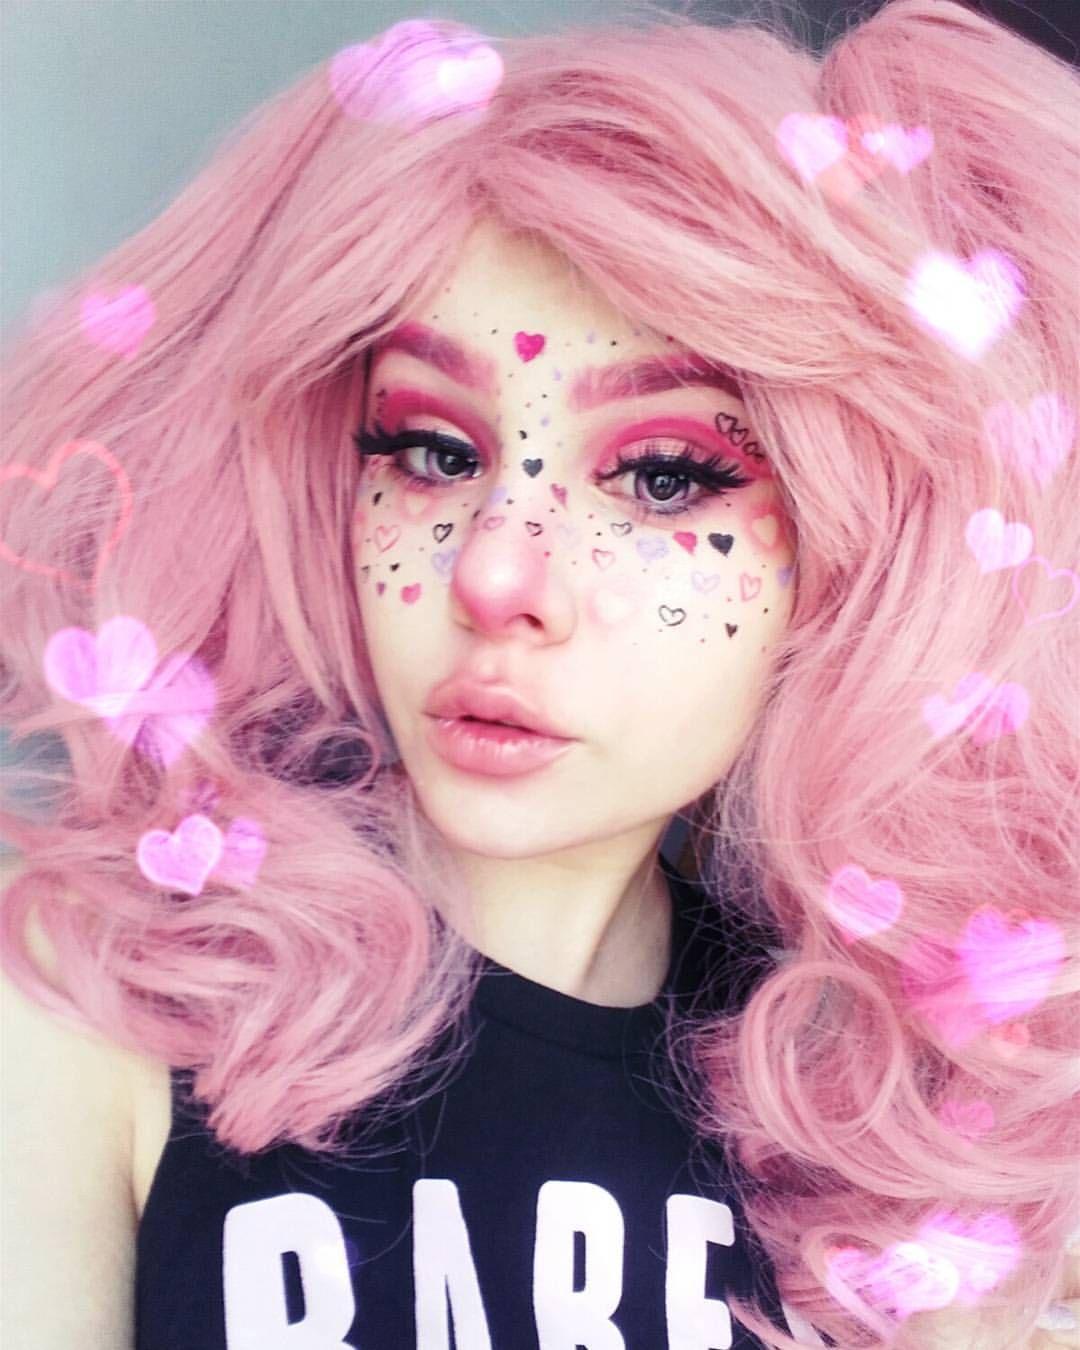 hisuxen.png on instagram Pastel makeup, Pastel goth